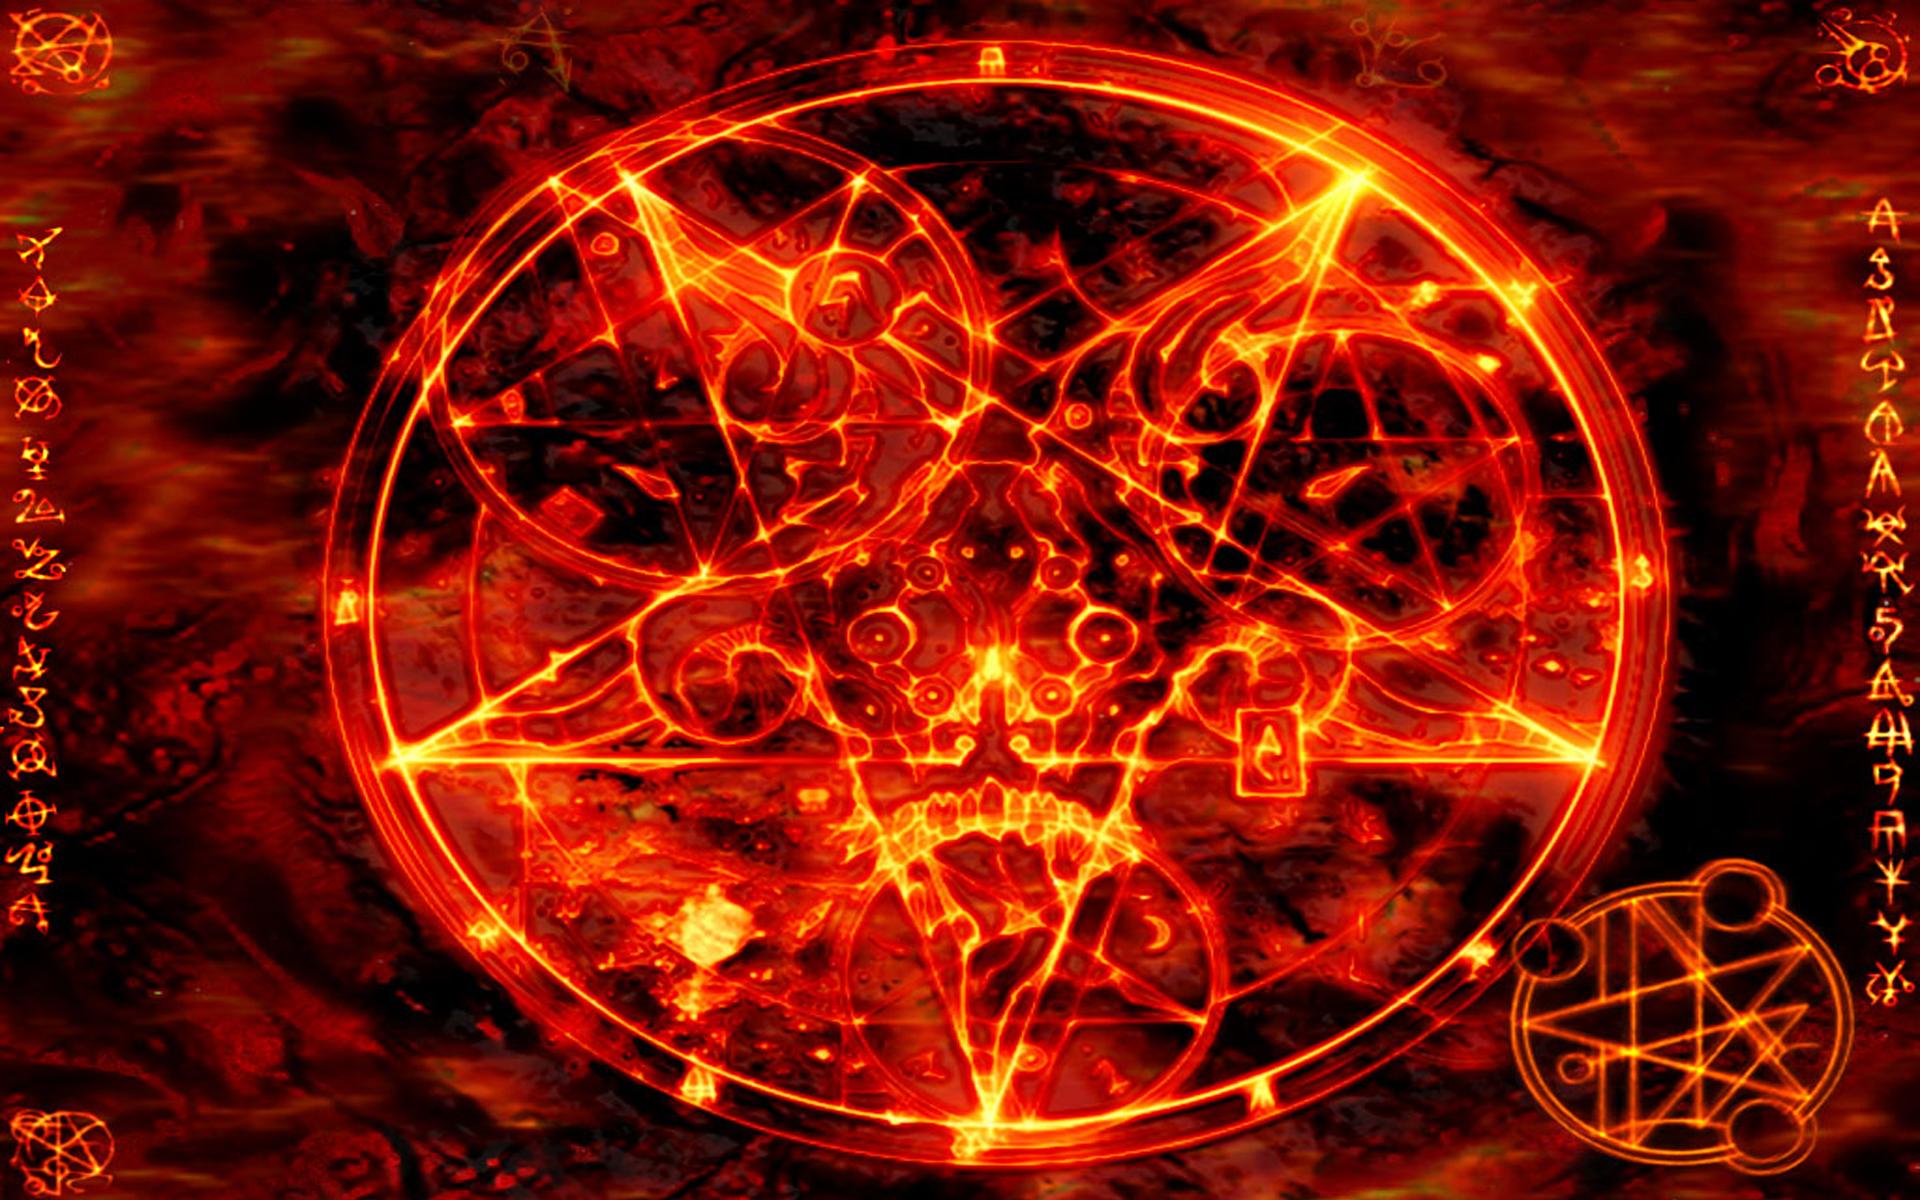 Pentagram satanic wallpaper 1920x1200 15829 WallpaperUP 1920x1200